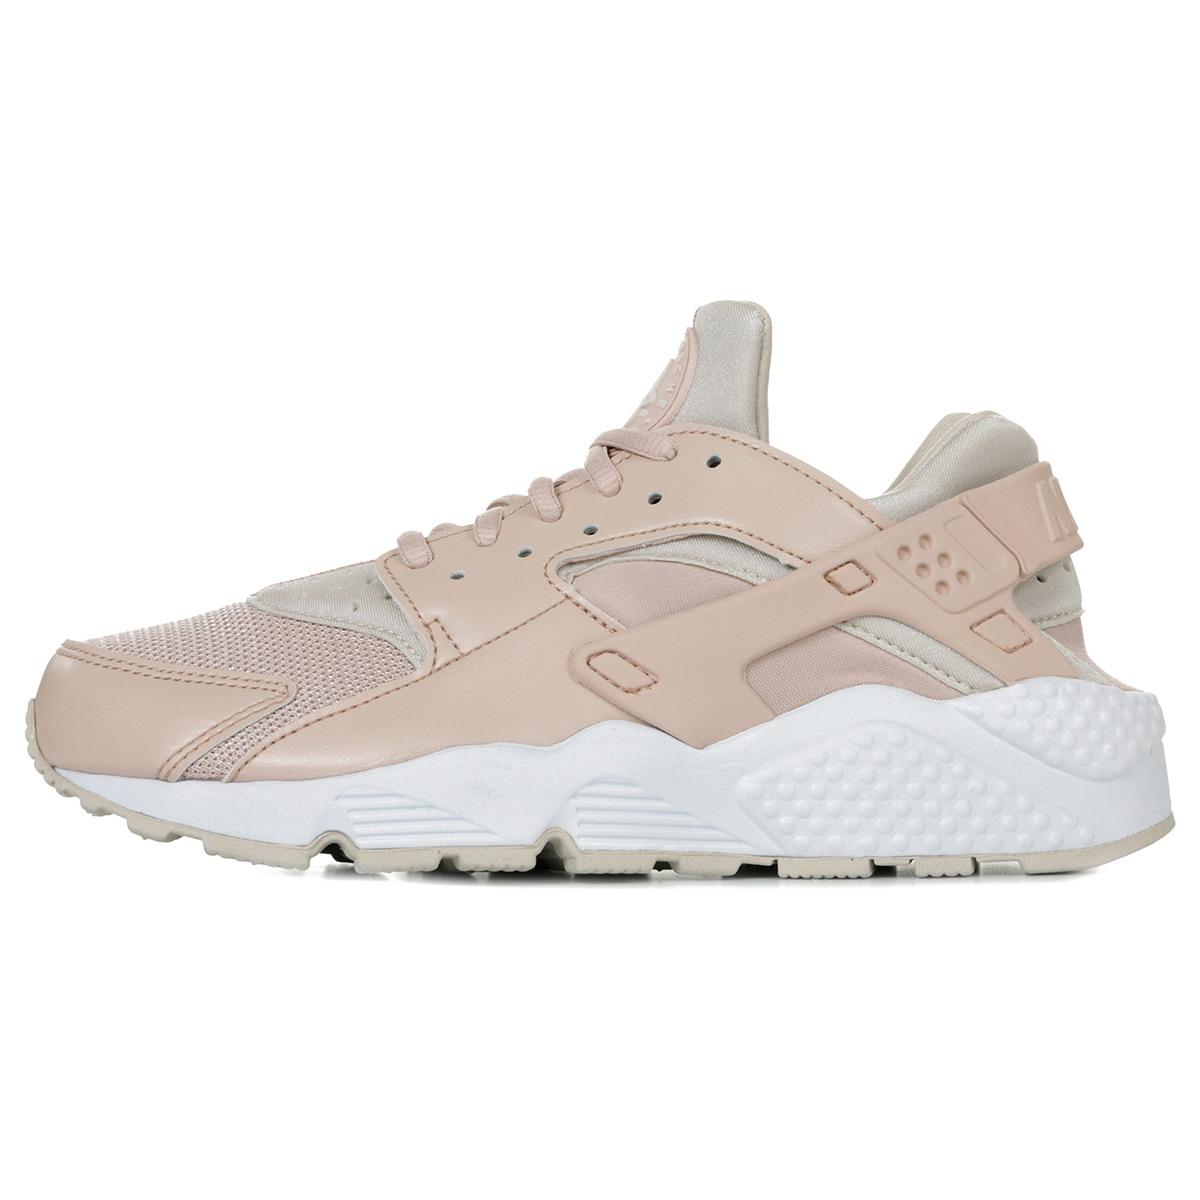 Chaussures-Baskets-Nike-femme-Wn-039-s-Air-Huarache-Run-034-Desert-Sand-034-taille-Beige miniature 2